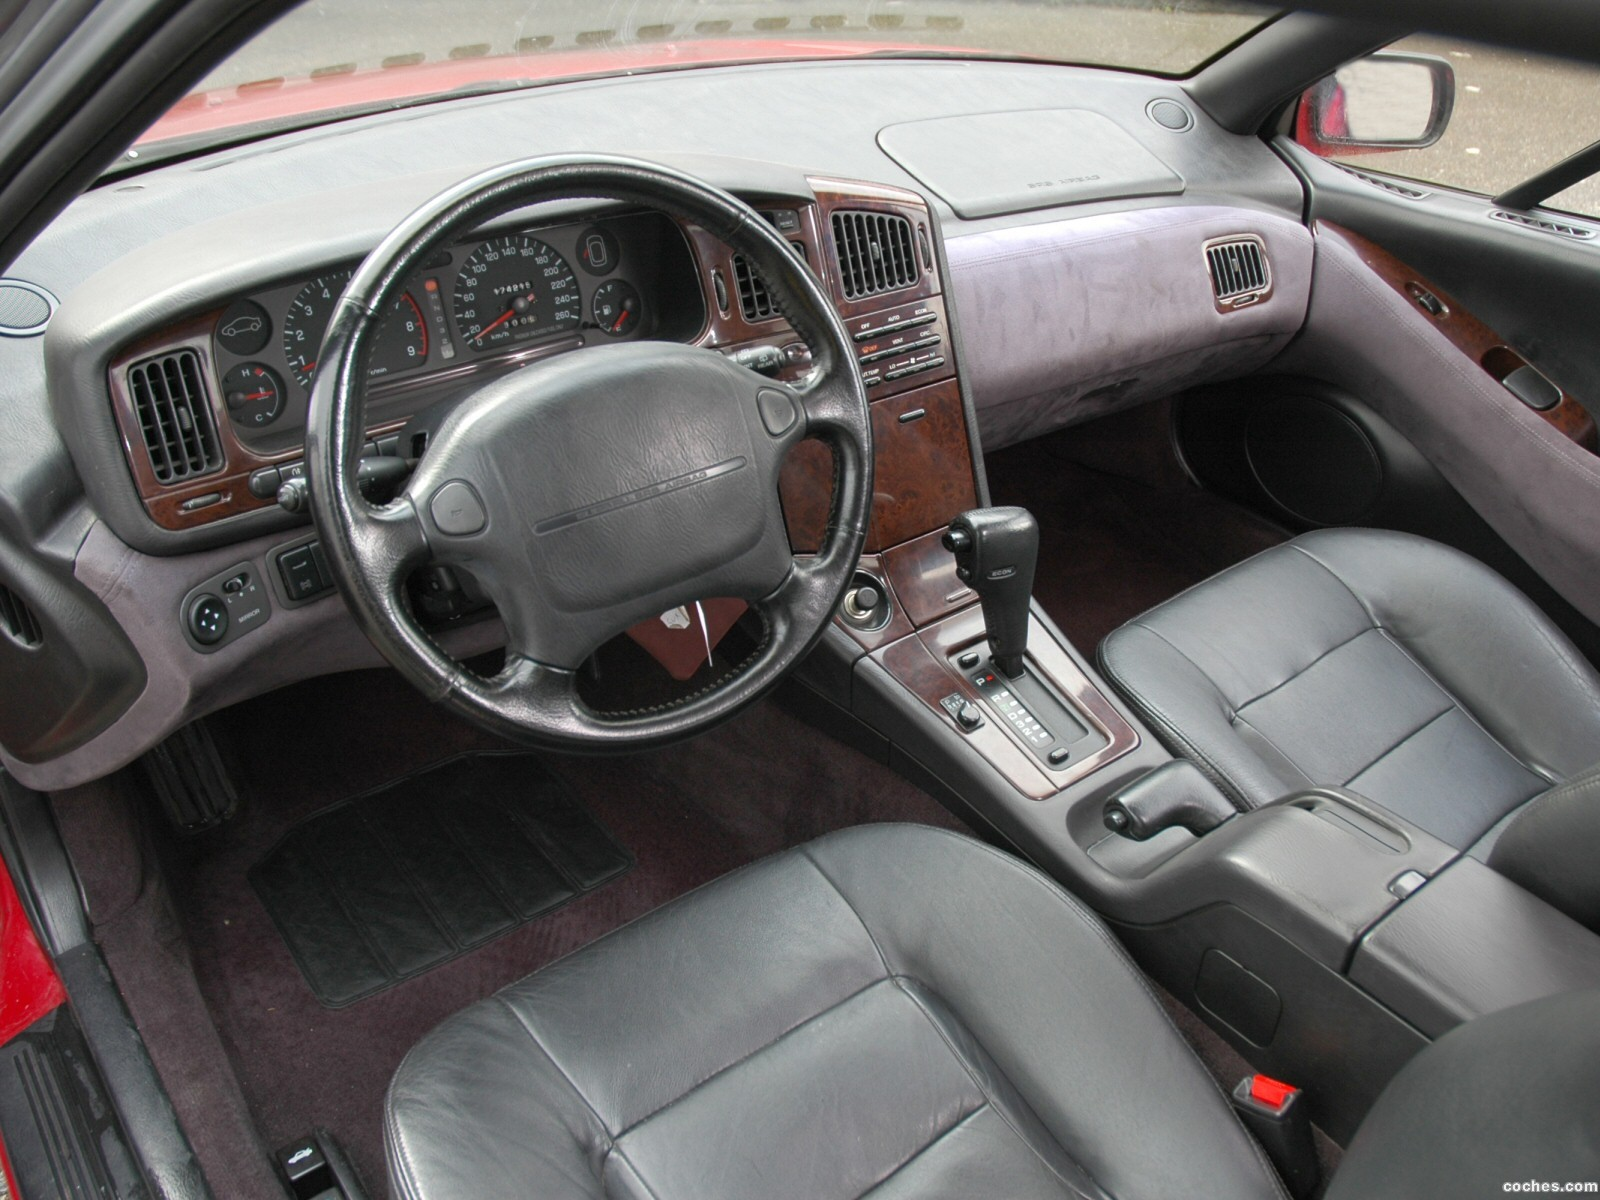 best way to restore steering wheel alcantara its ruining the interior autodetailing. Black Bedroom Furniture Sets. Home Design Ideas